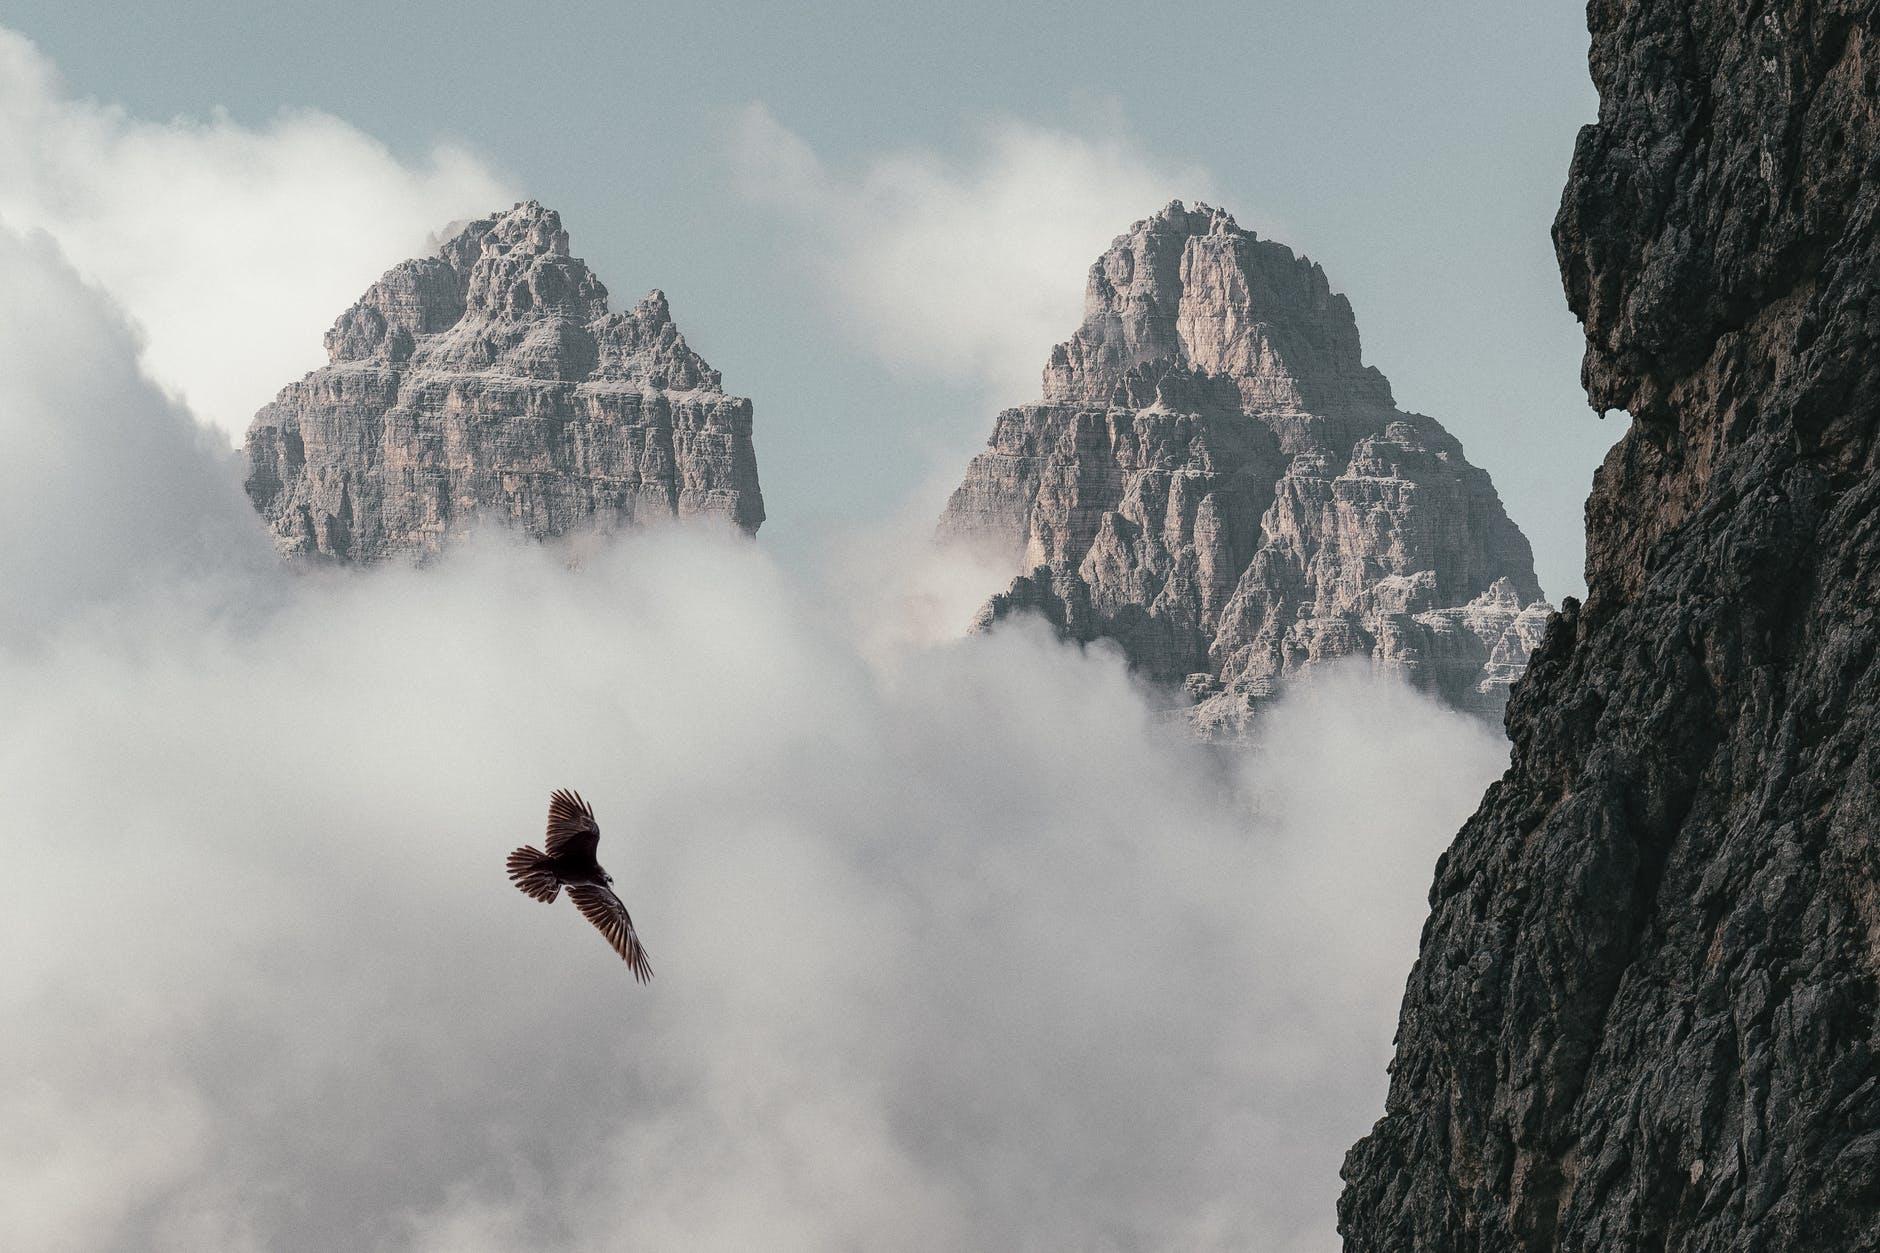 brown bird flying near mountain